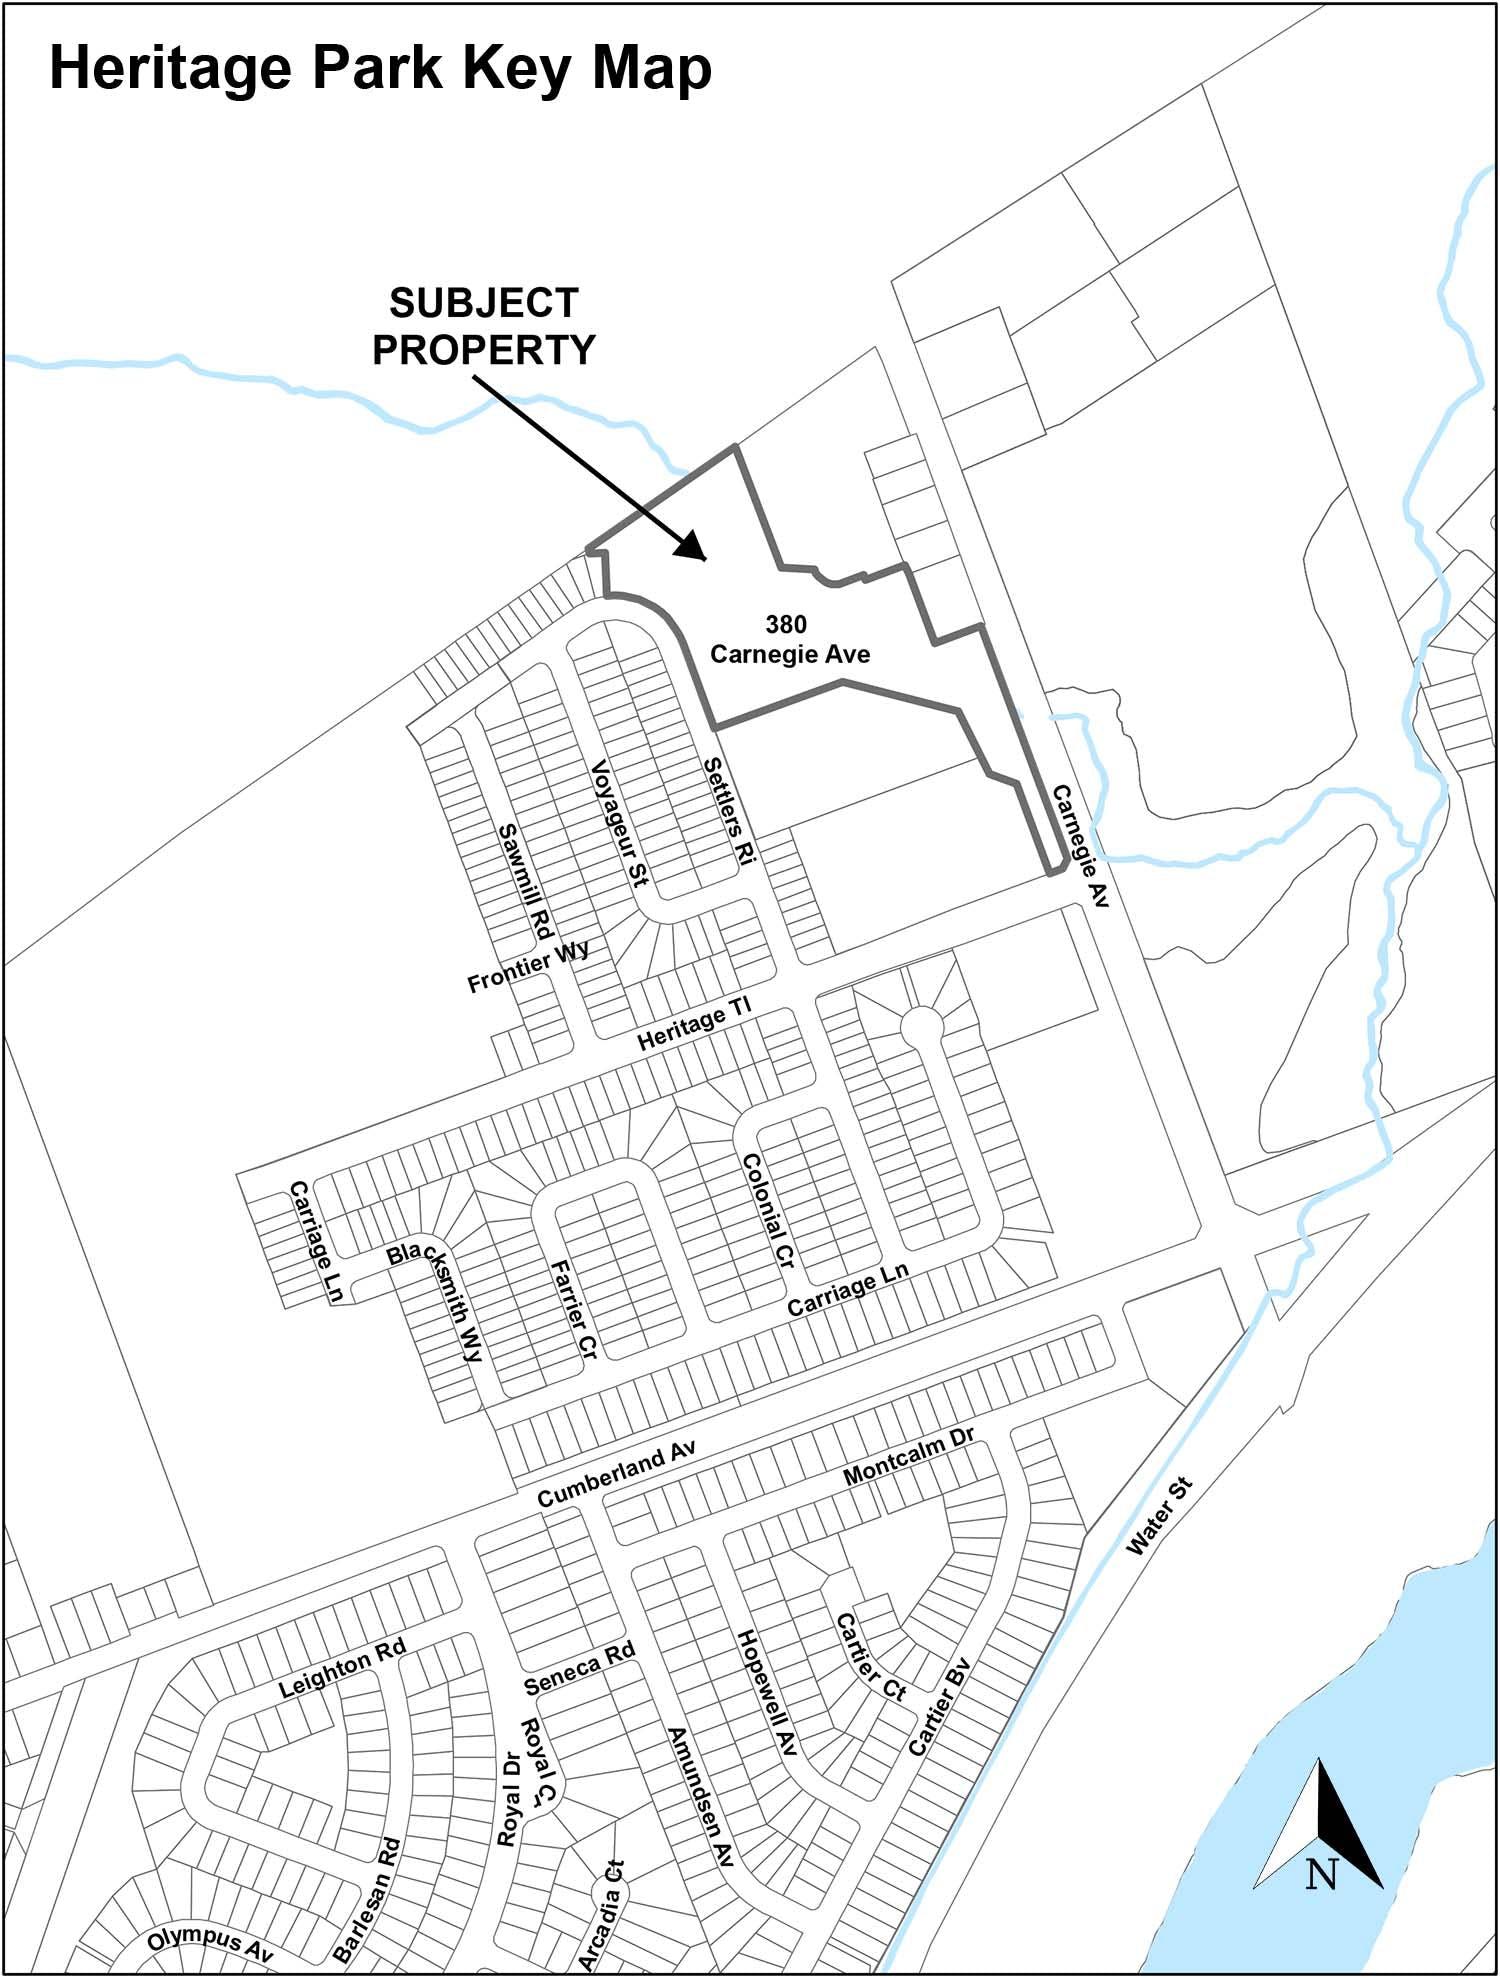 Heritage Park - Key Map.jpg